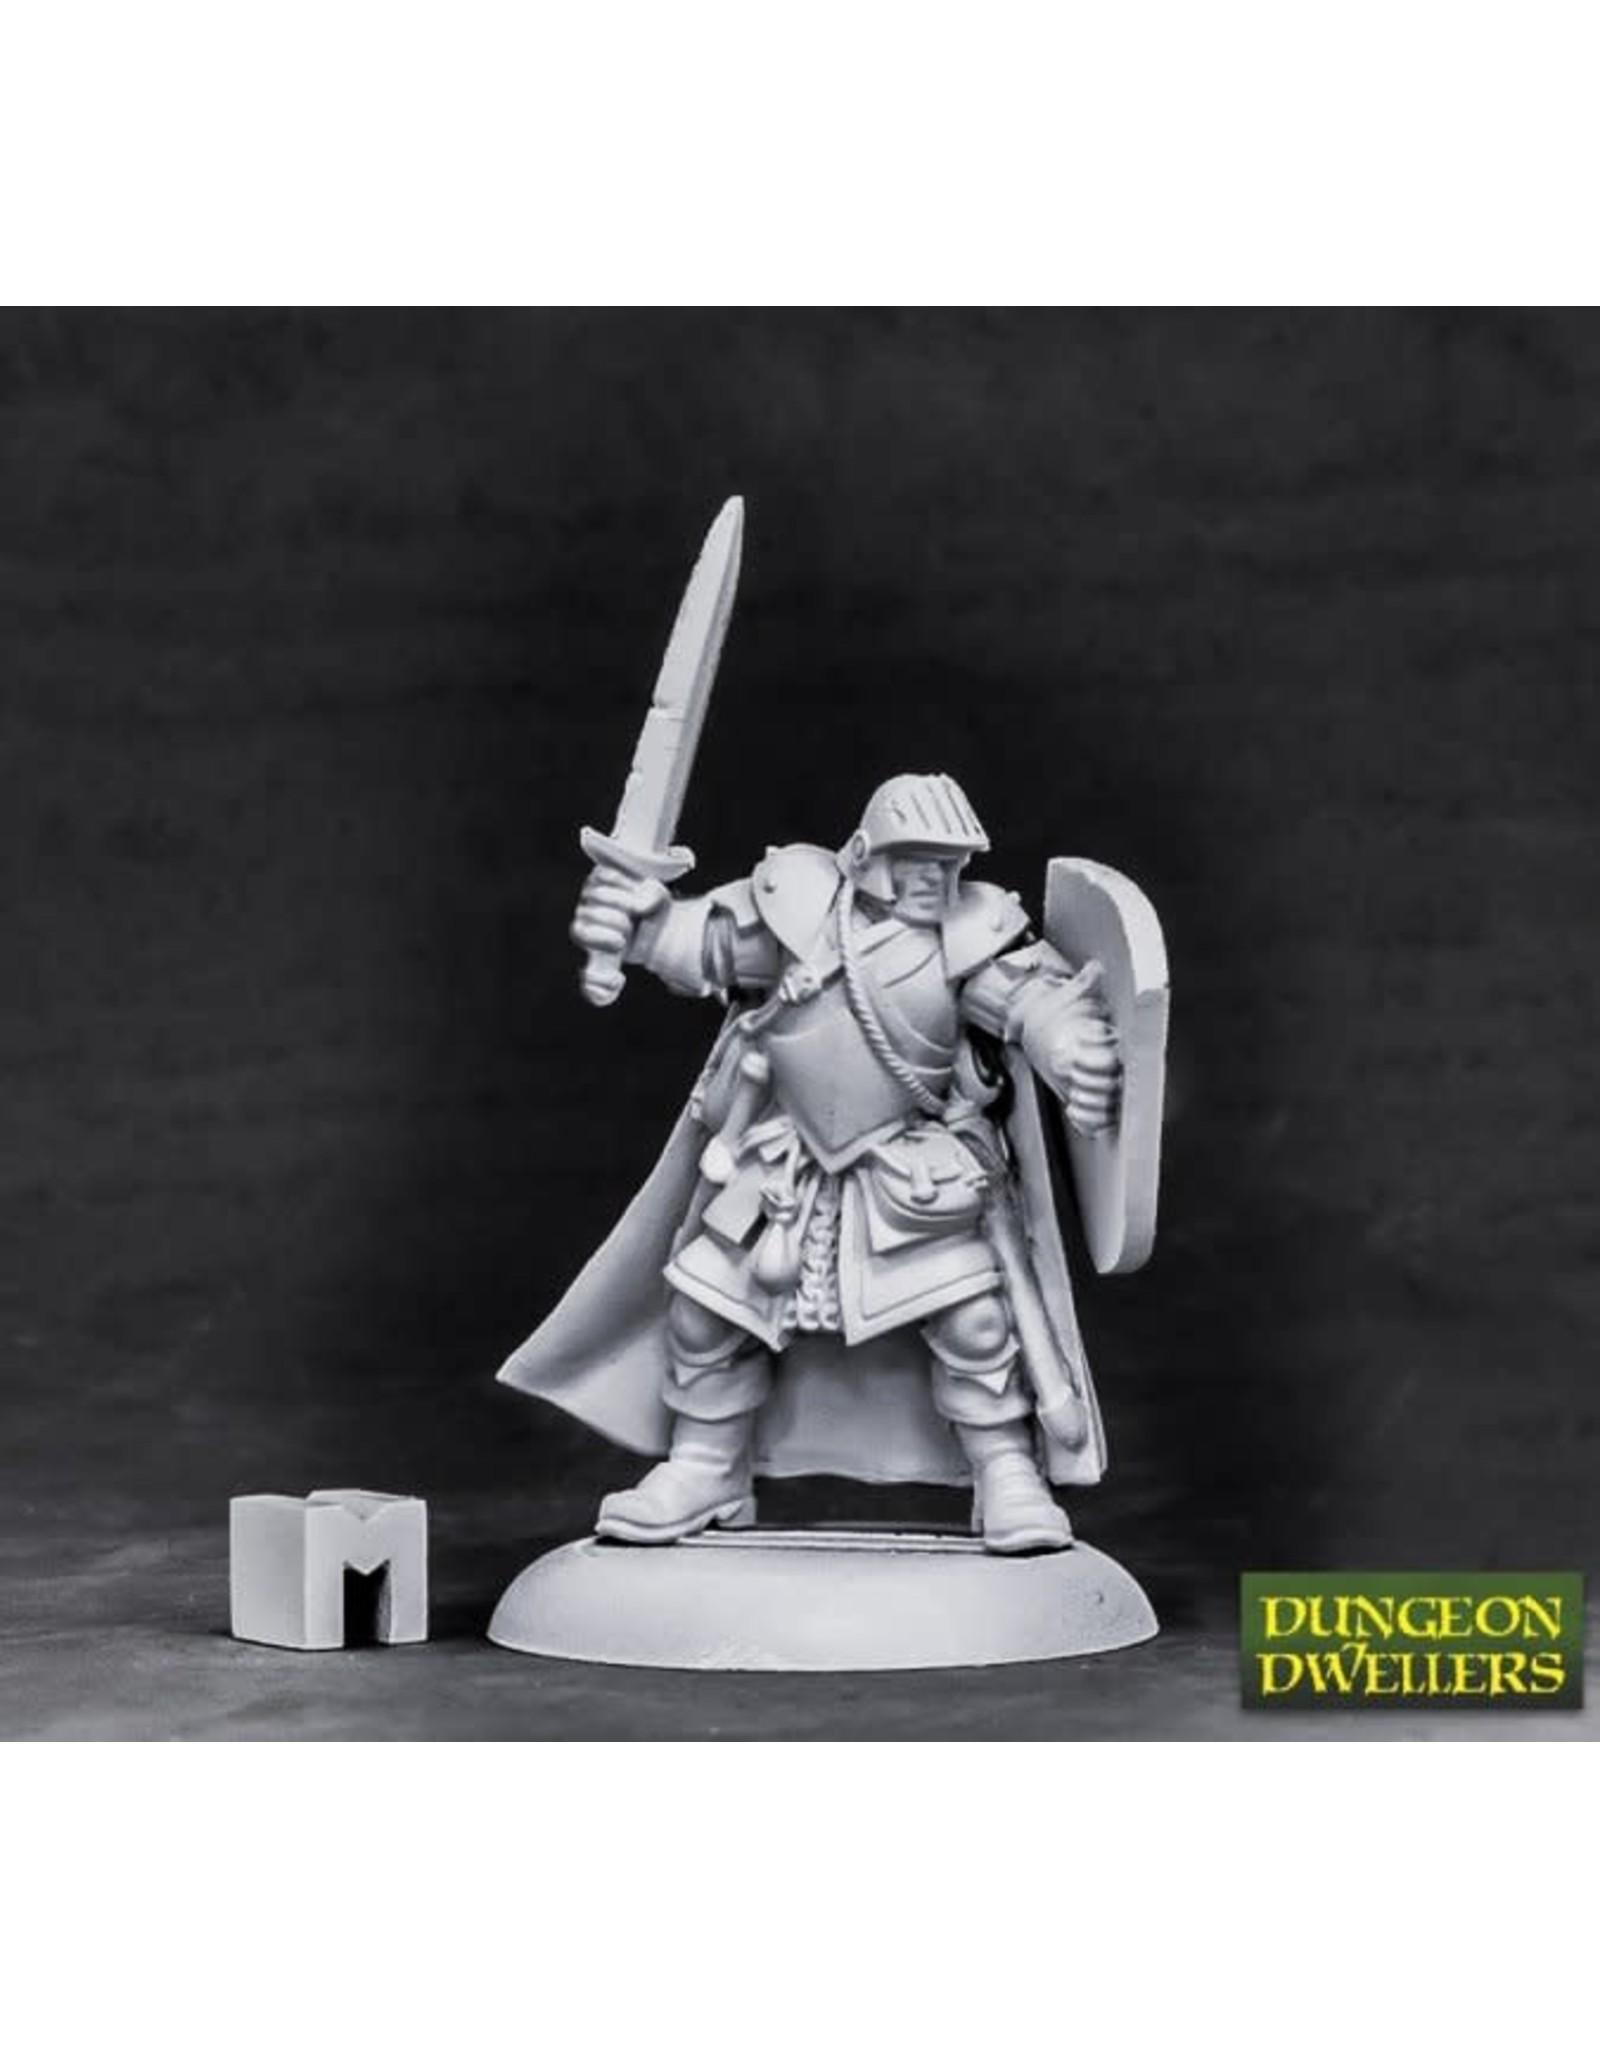 Reaper Dungeon Dwellers: Baran Blacktree, Veteran Warrior